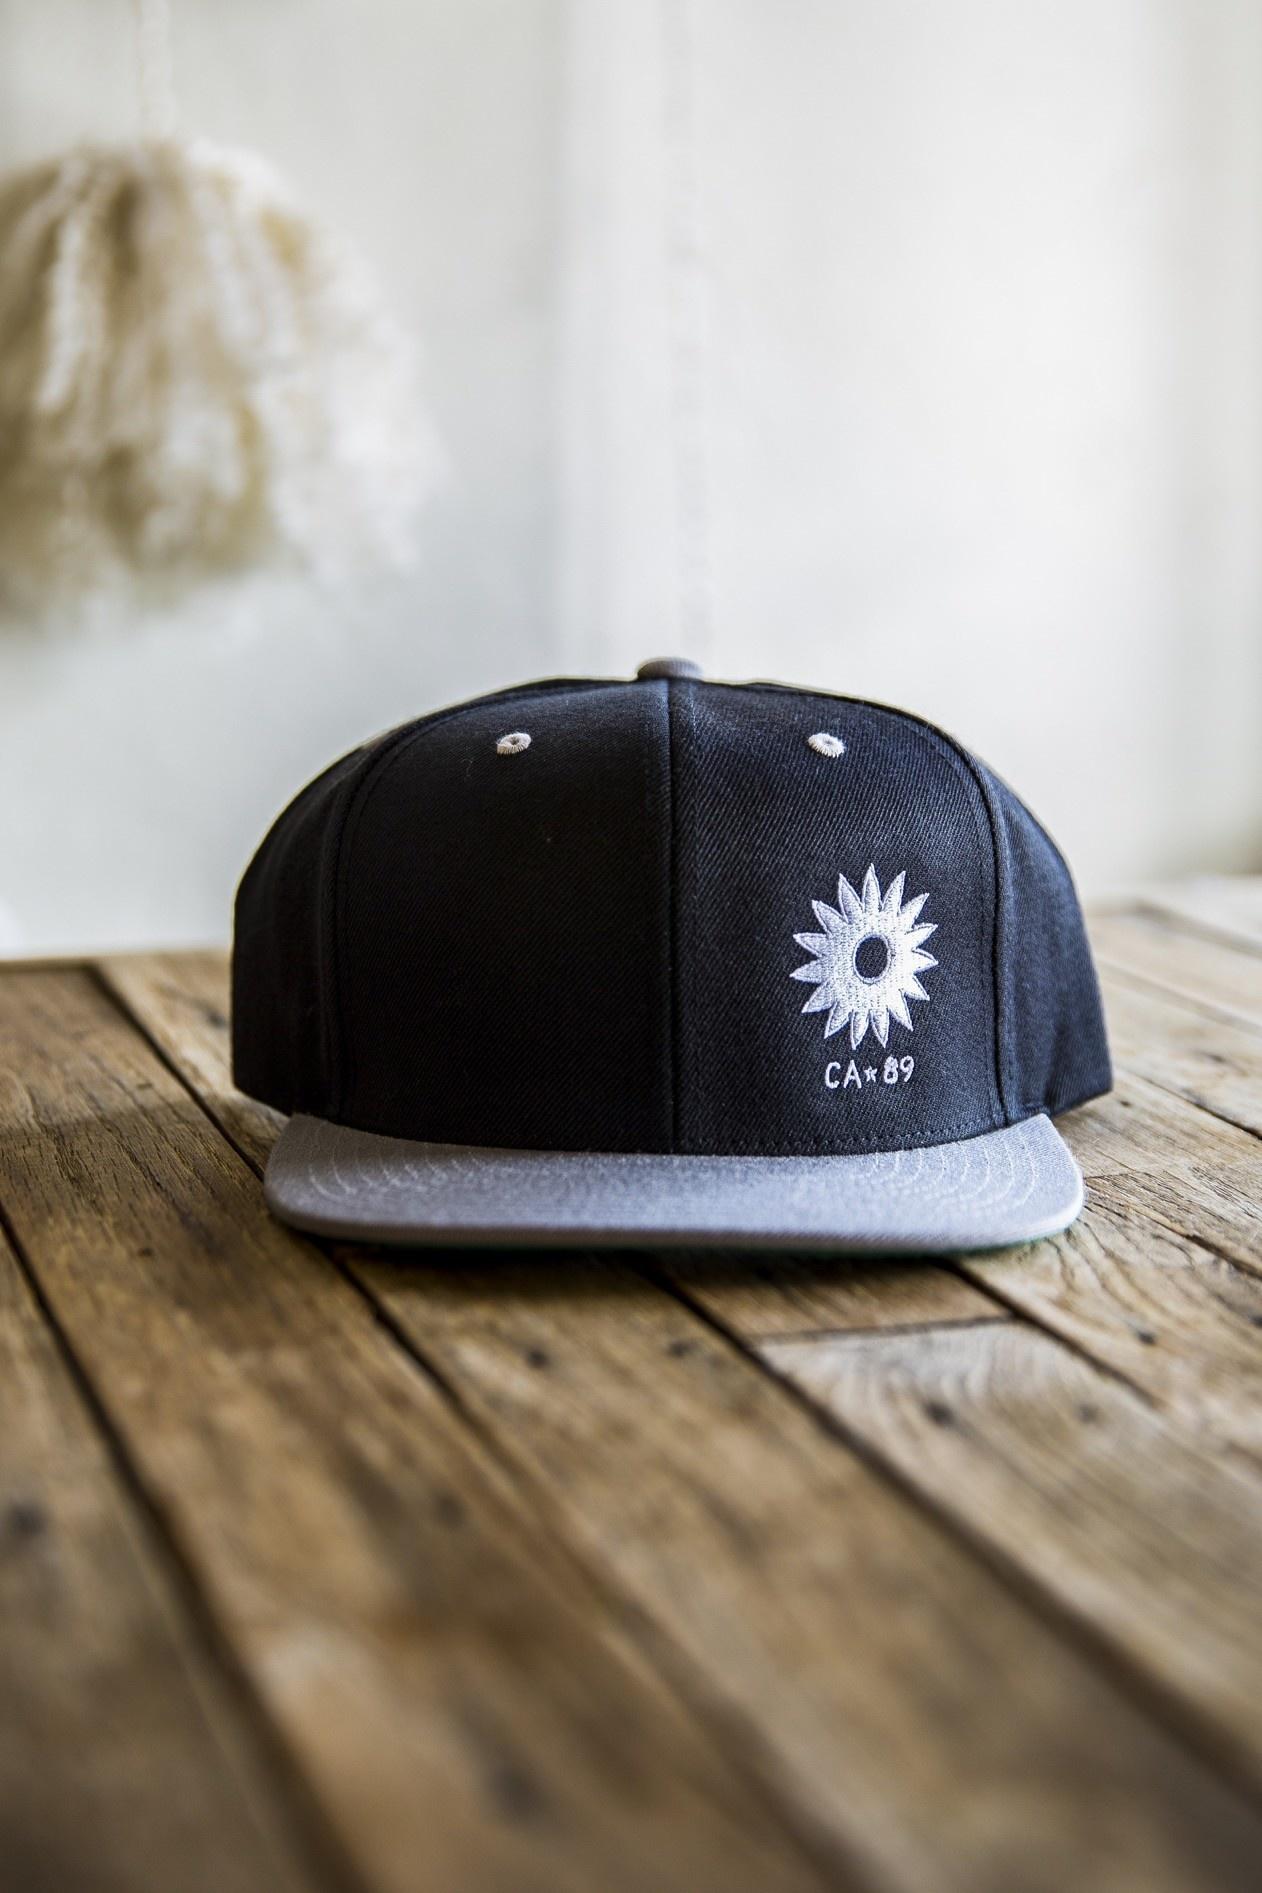 California 89 Sunflower Flattop Snapback Cap